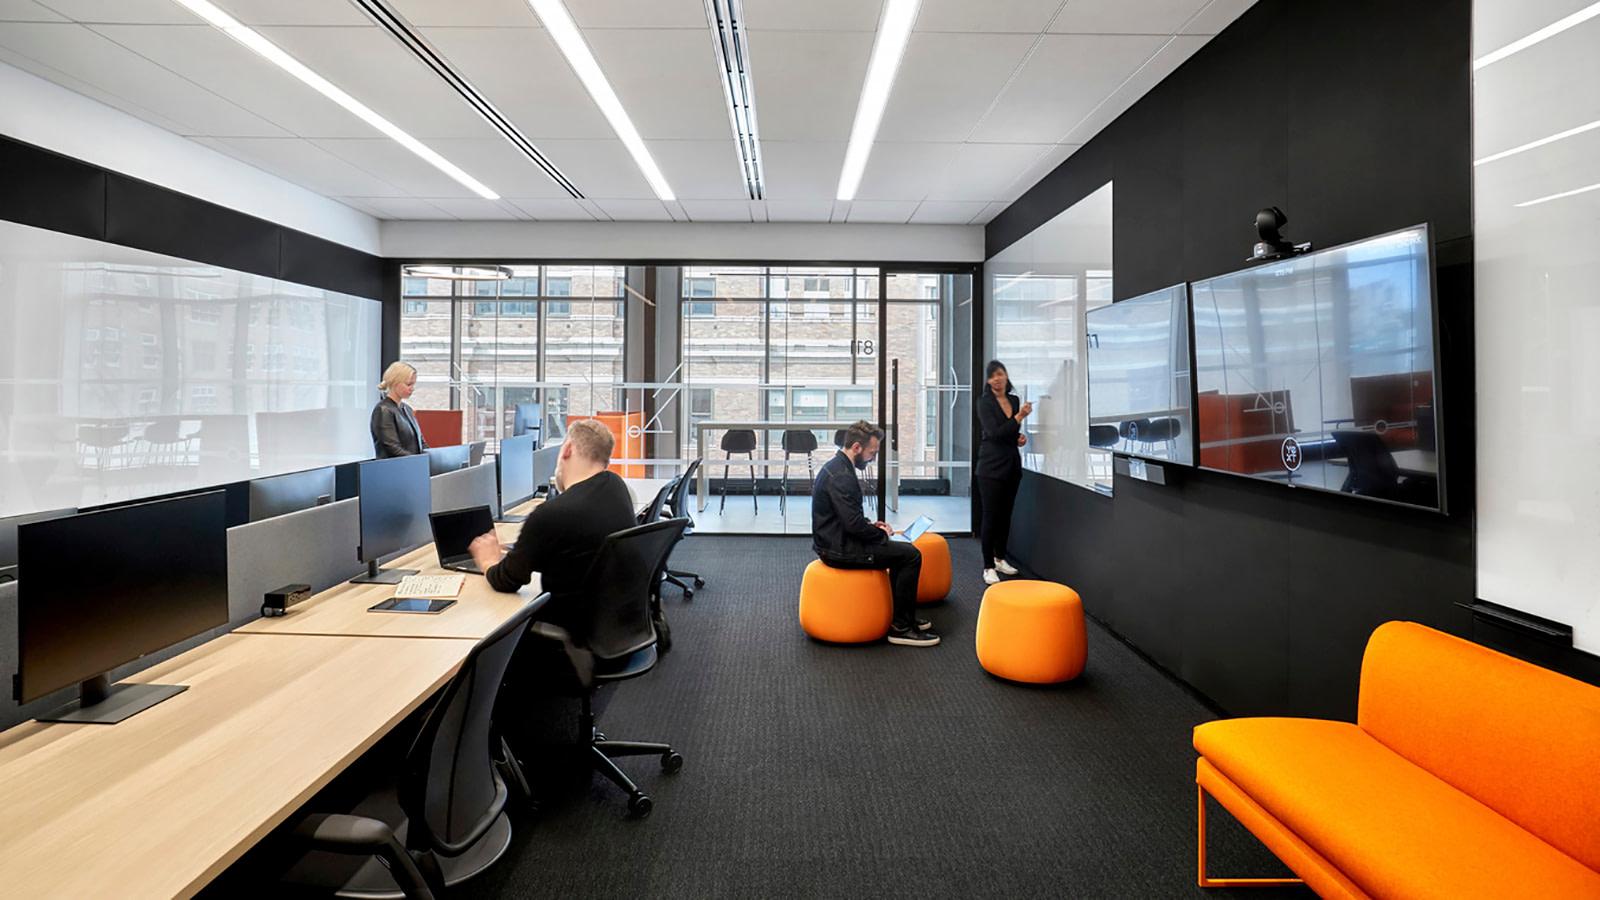 Yext NYC offers flexible seating around standing desks